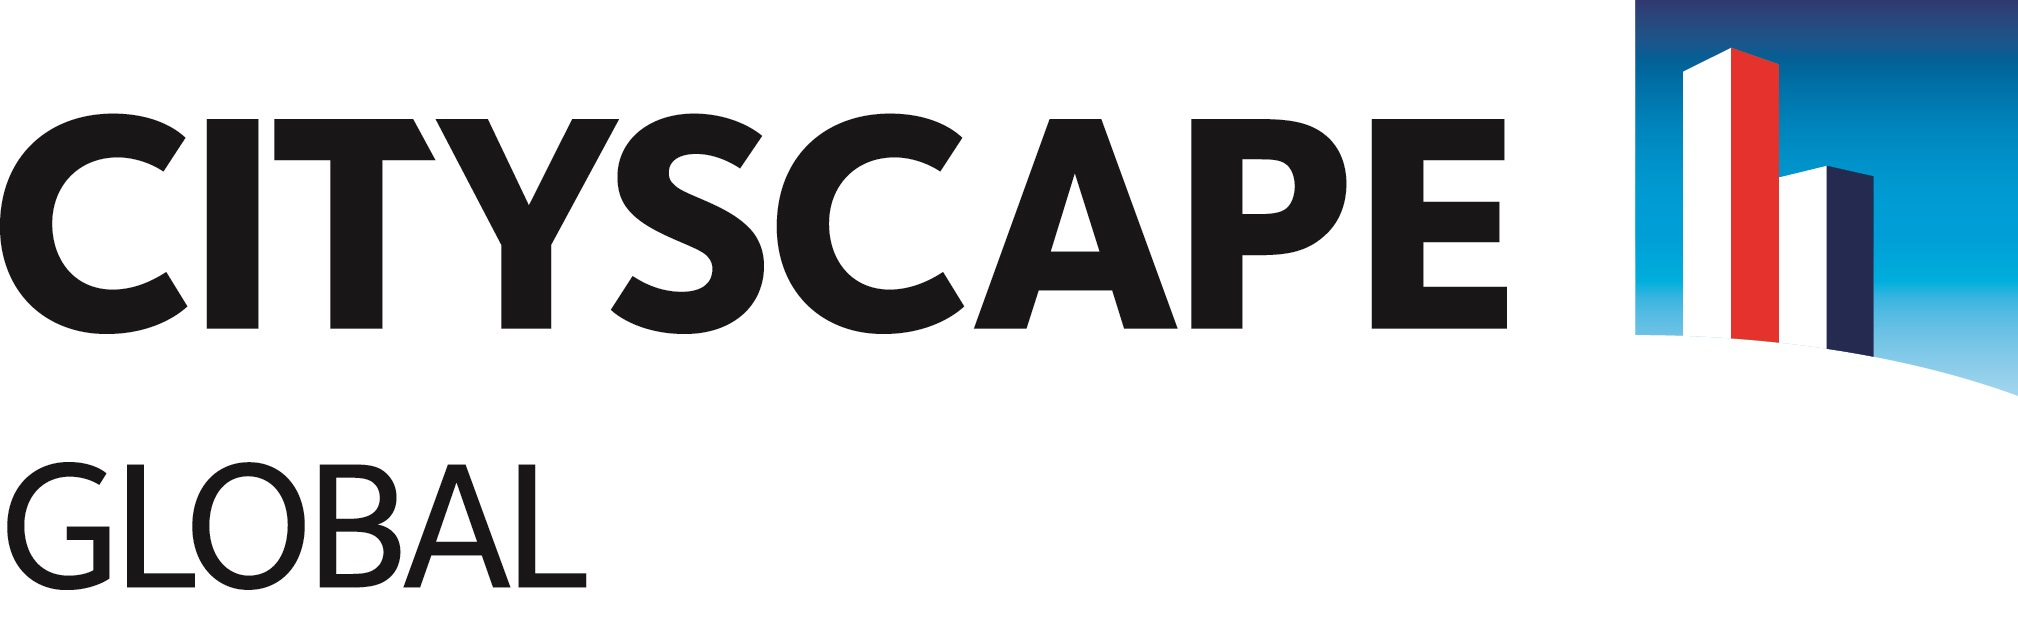 Cityscape Global 2018